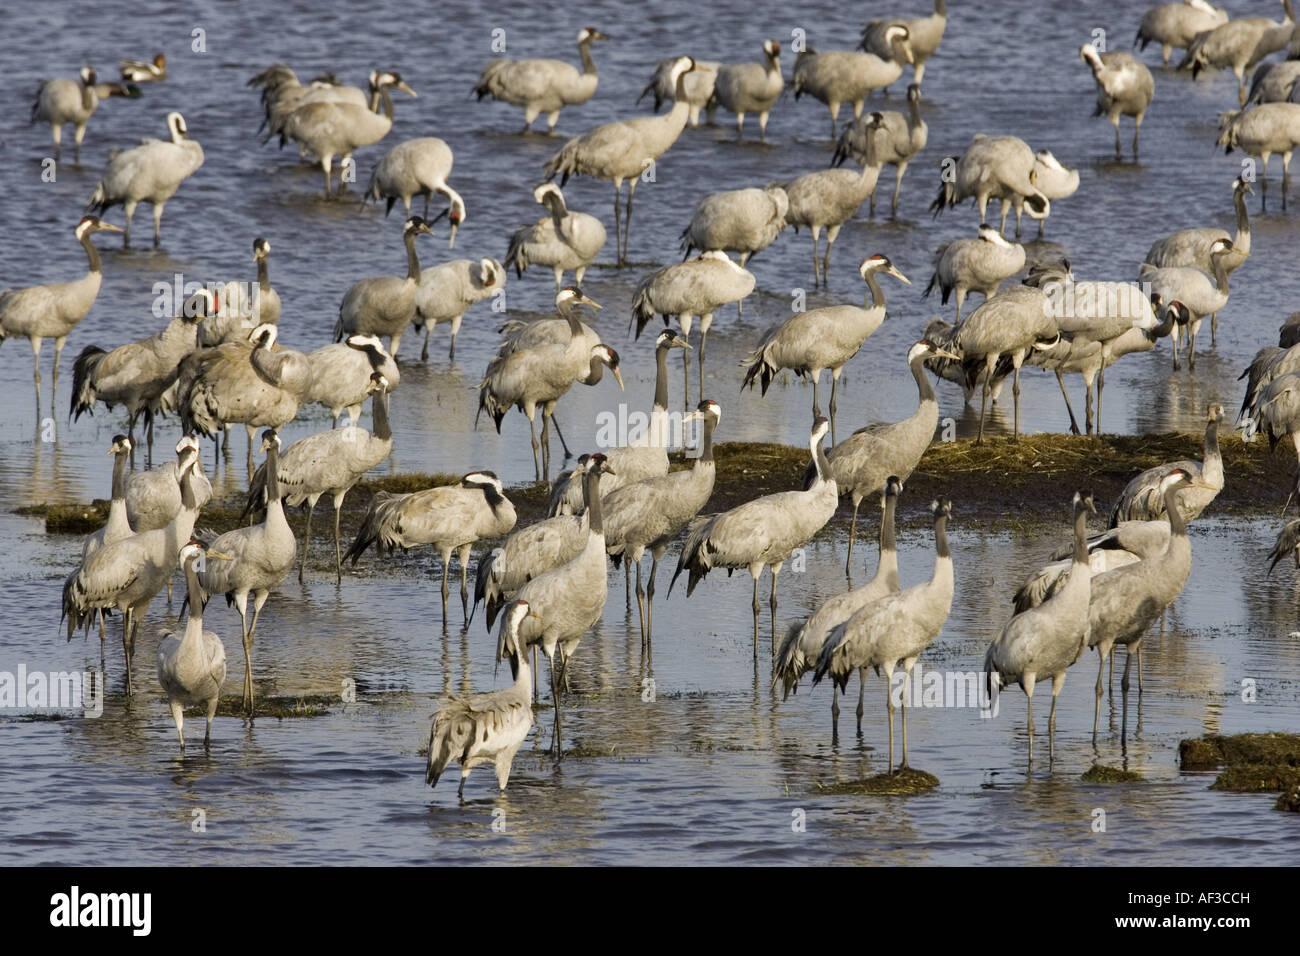 common crane (Grus grus), flock standing in water, Sweden, Hornborgasjoen - Stock Image